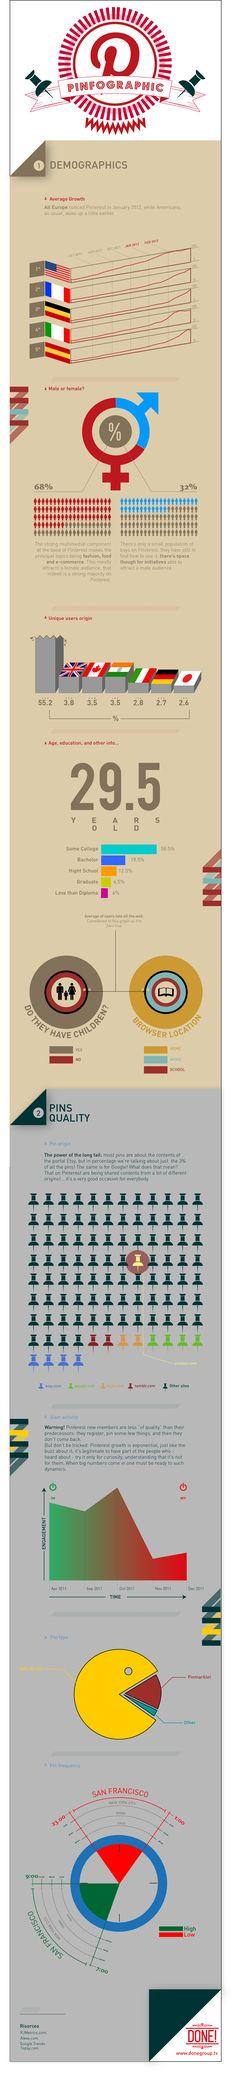 Quién usa Pinterest #infografia #infographic #socialmedia